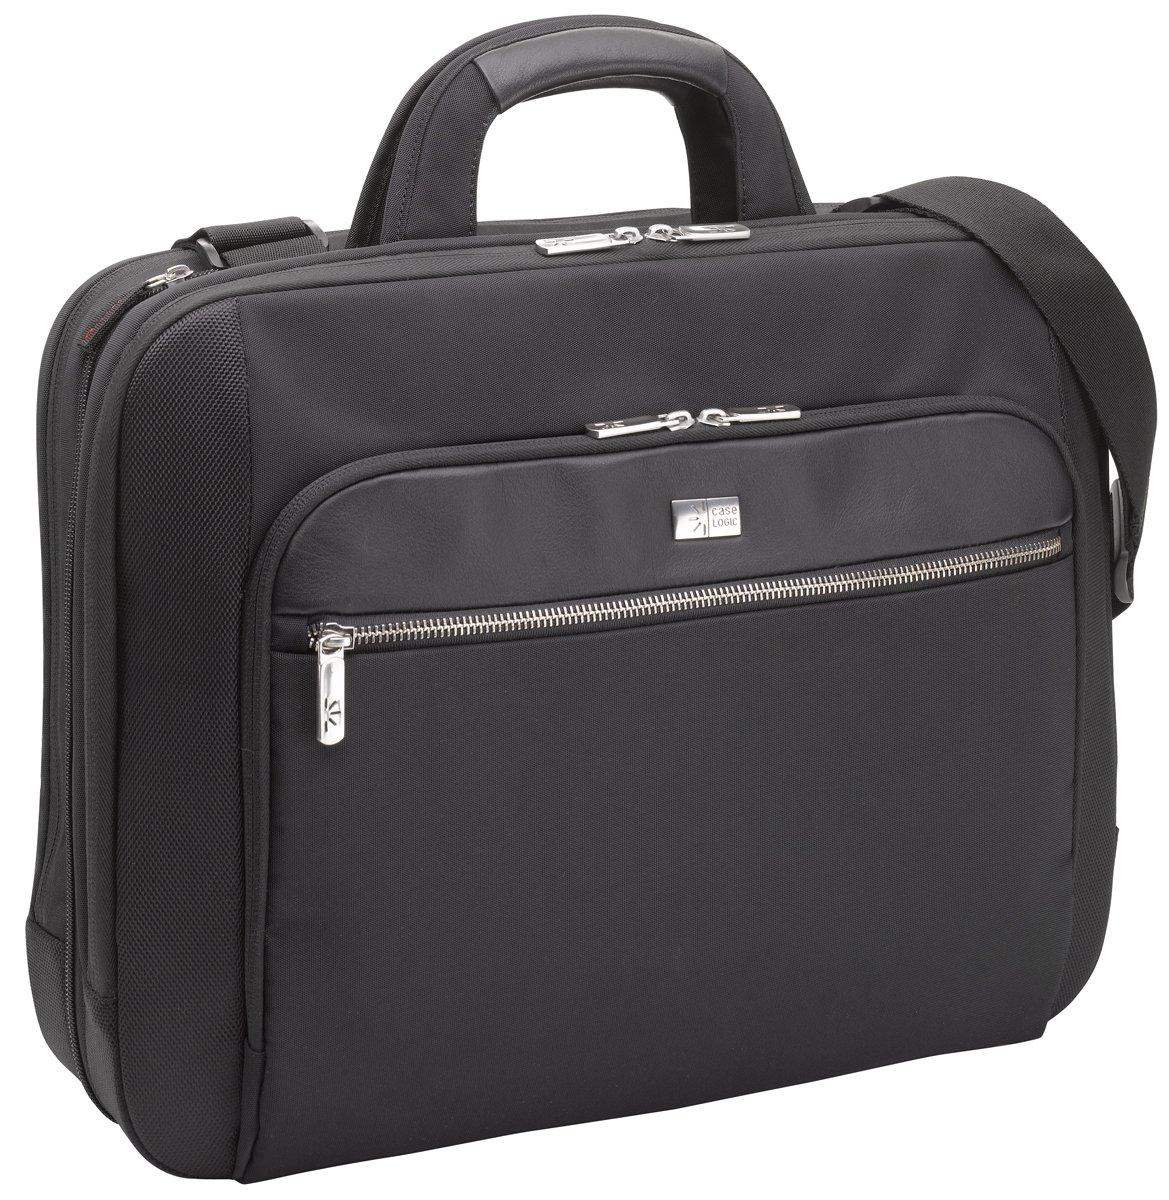 Case Logic CL LineセキュリティFriendlyブリーフケース One Size CLCS-116 BLACK  ブラック B001O83XR4